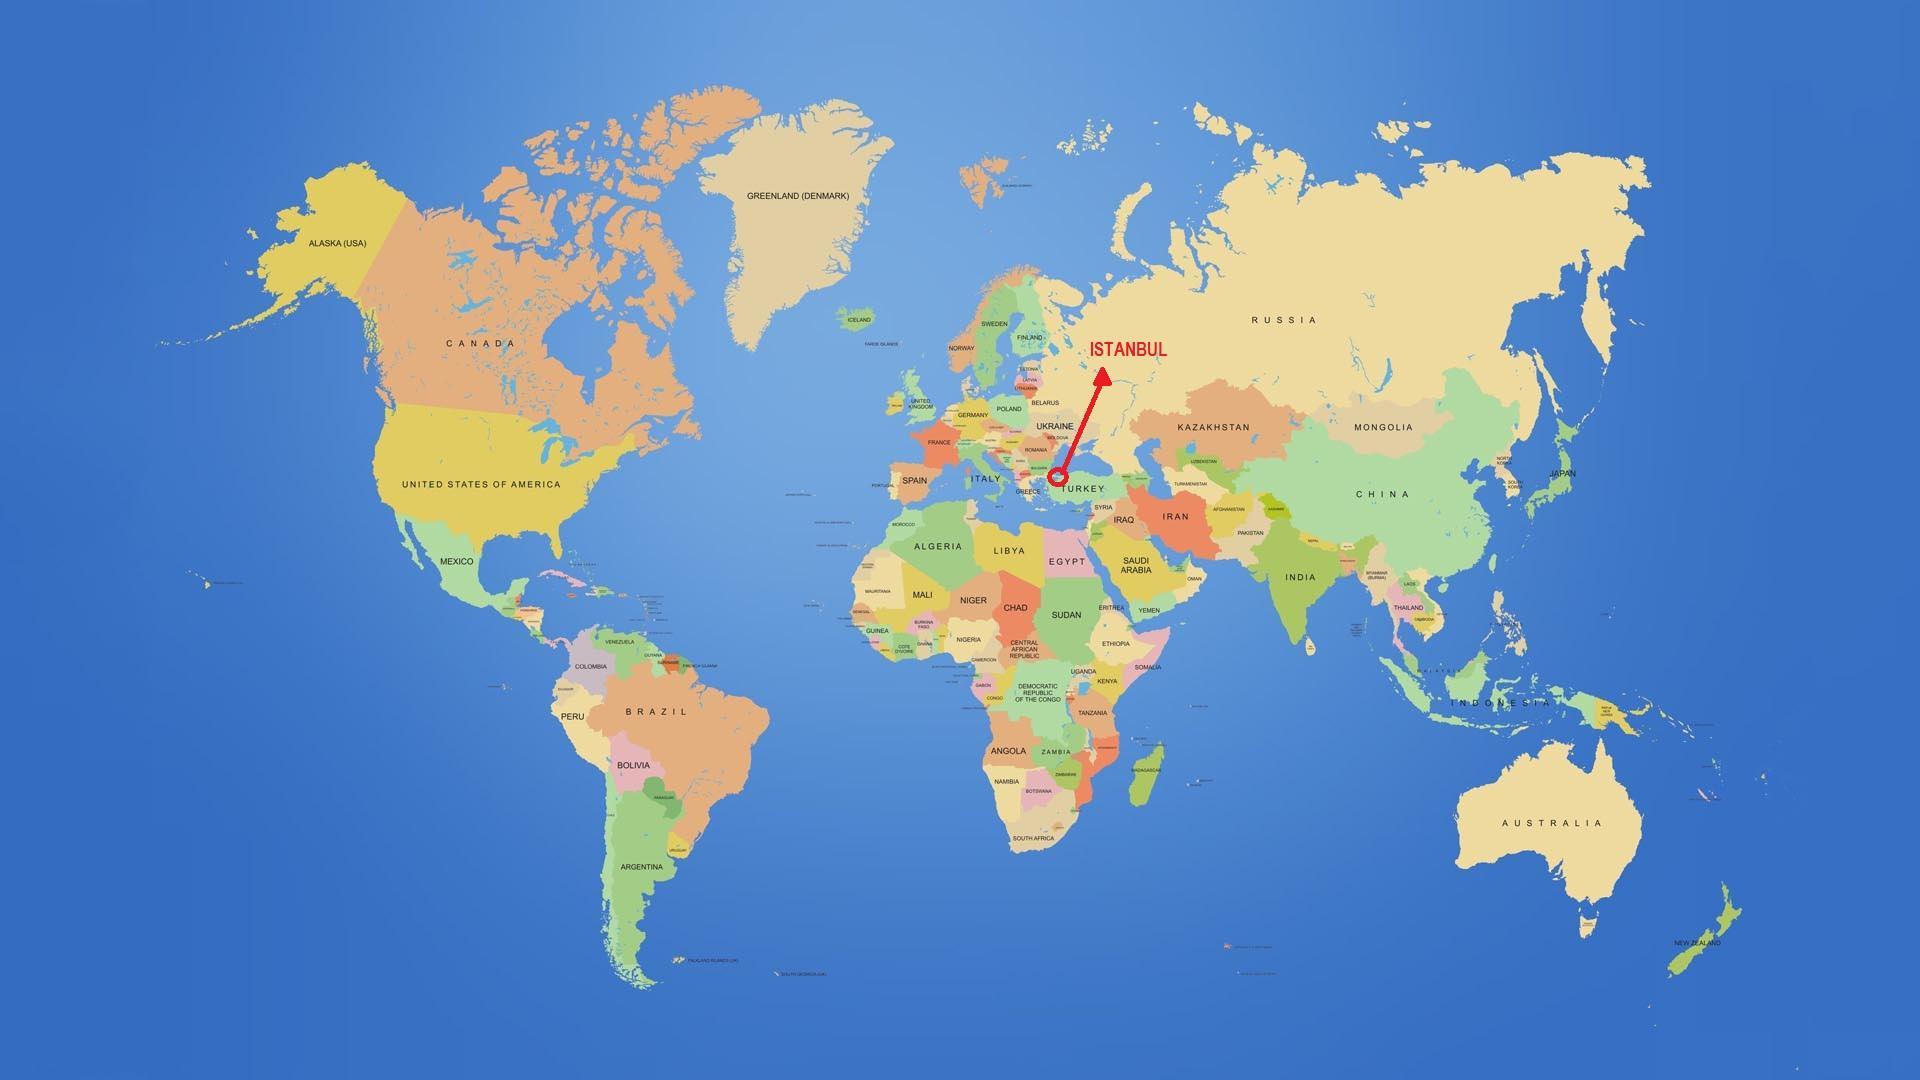 Istanbul on world map - Istanbul turkey world map (Turkey)